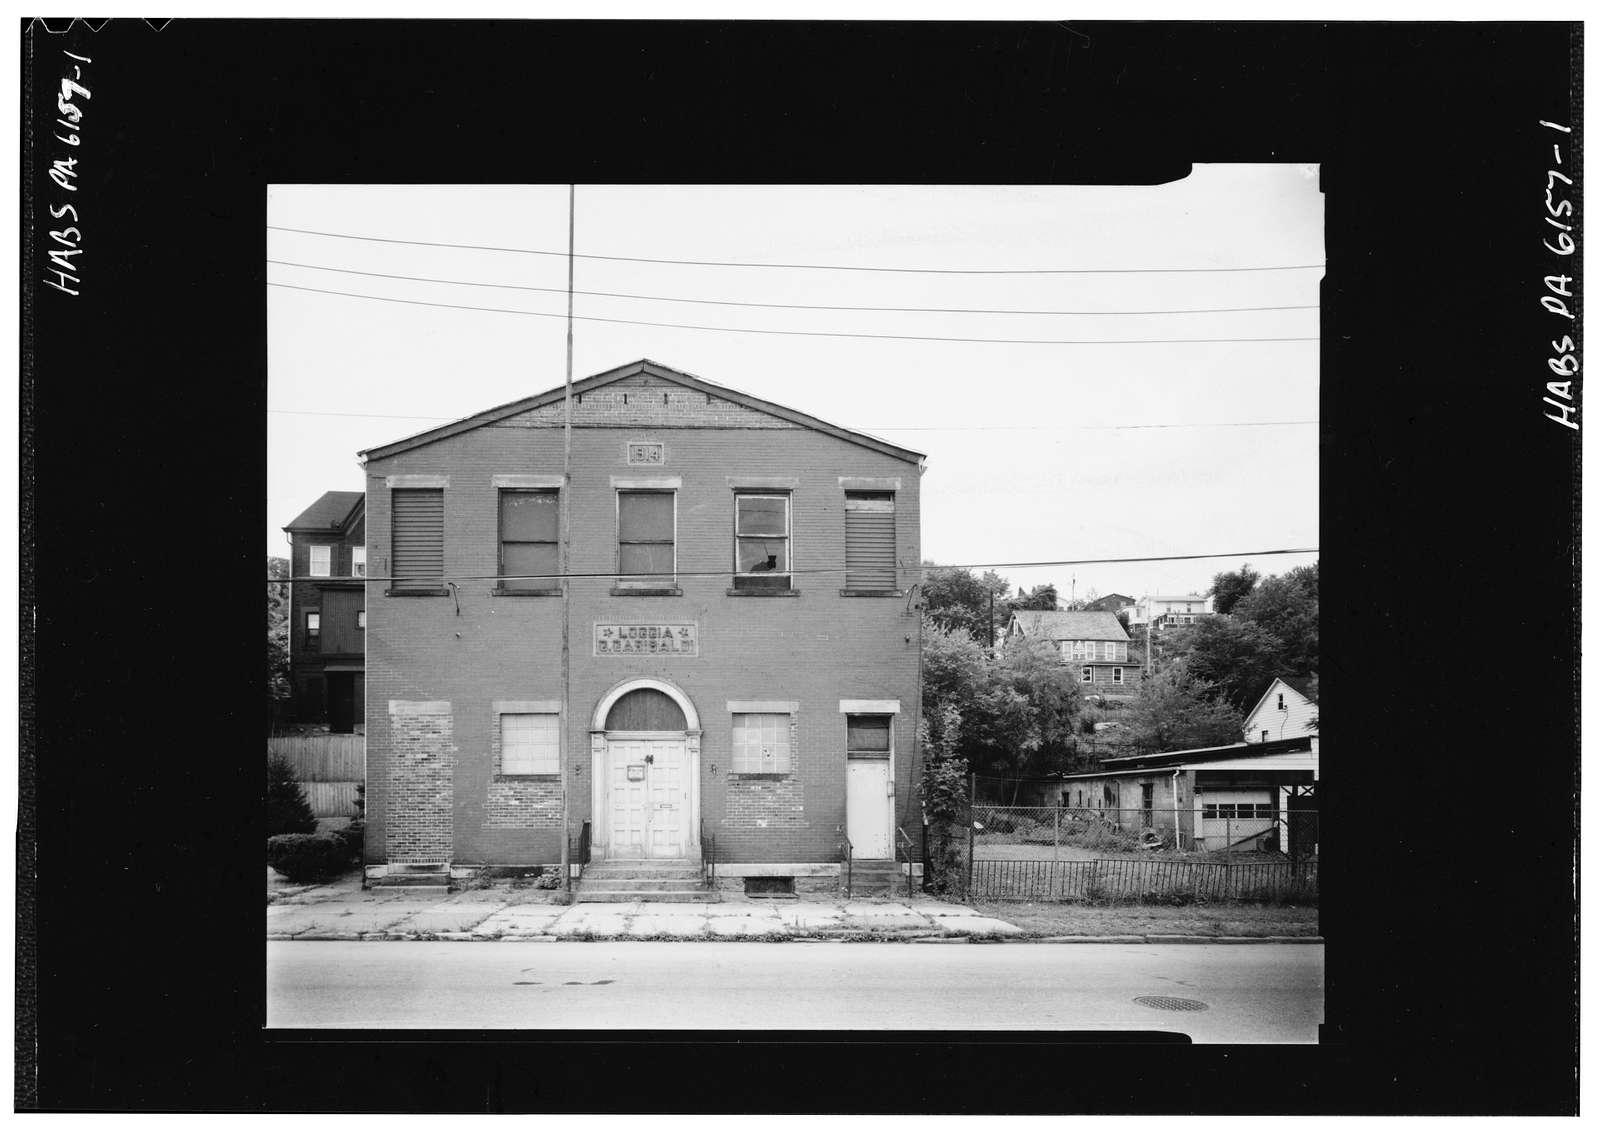 G. Garibaldi Hall, Lowry Avenue, Jeannette, Westmoreland County, PA